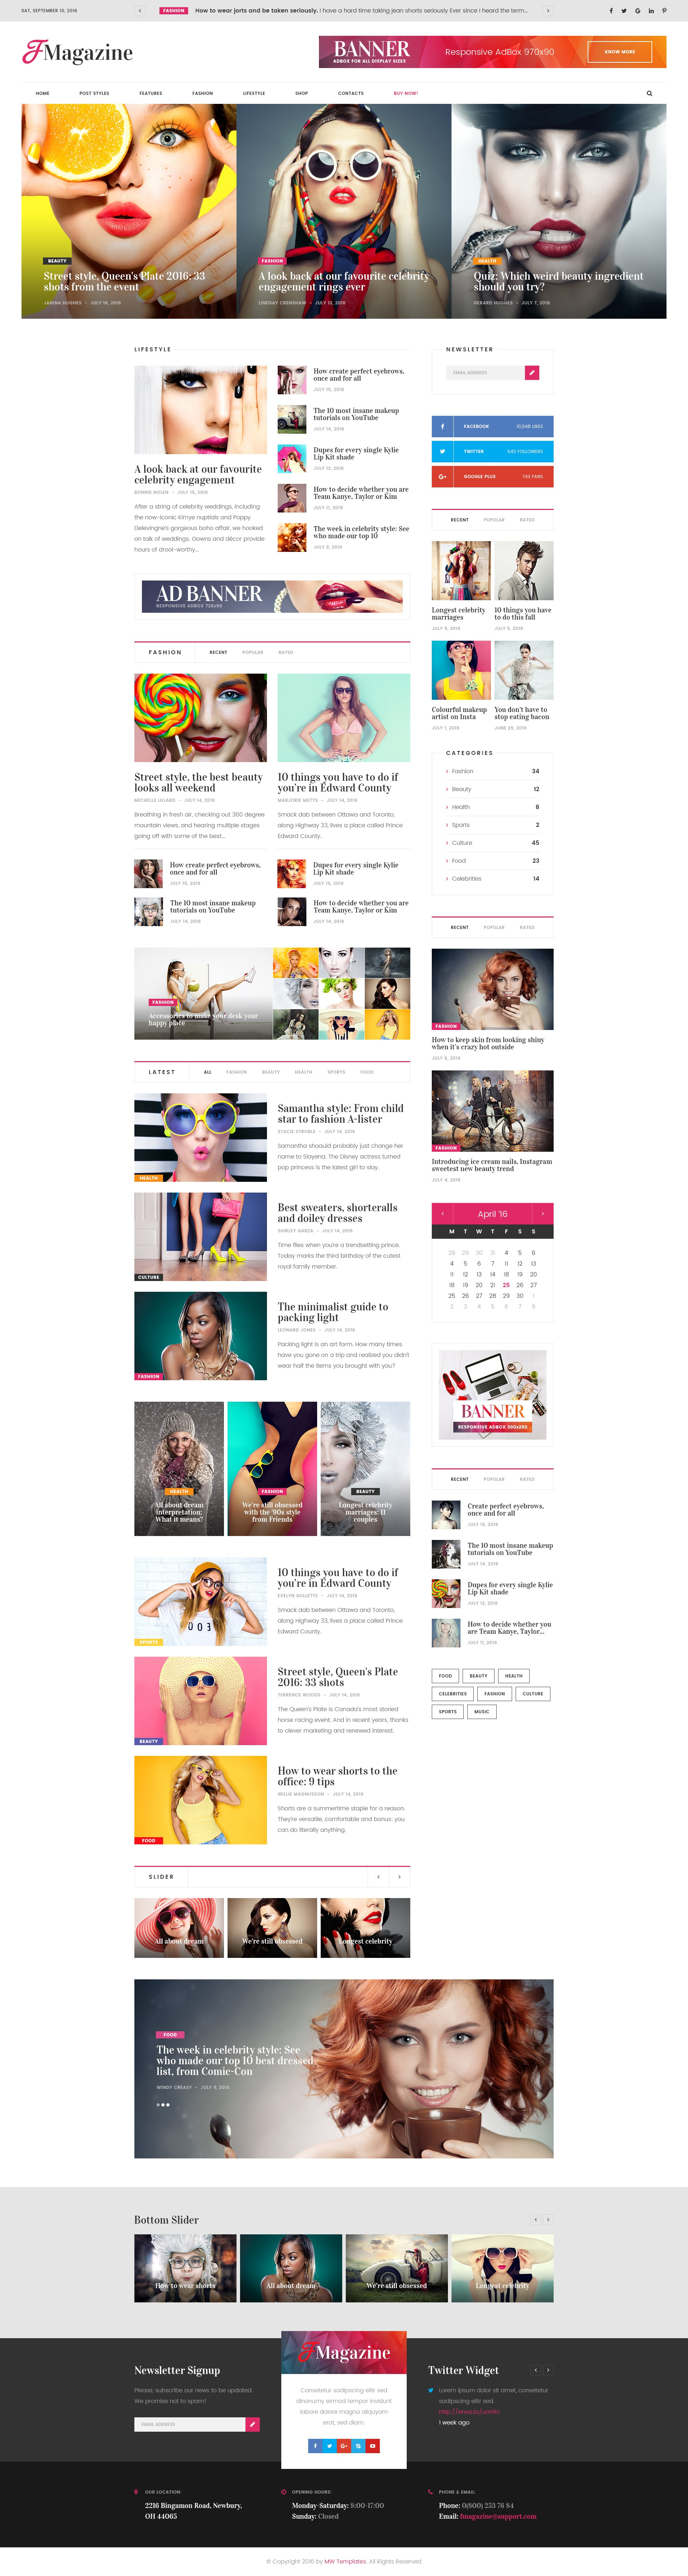 Truemag Multiconcept Magazineblognewspaper Psd Template Psd